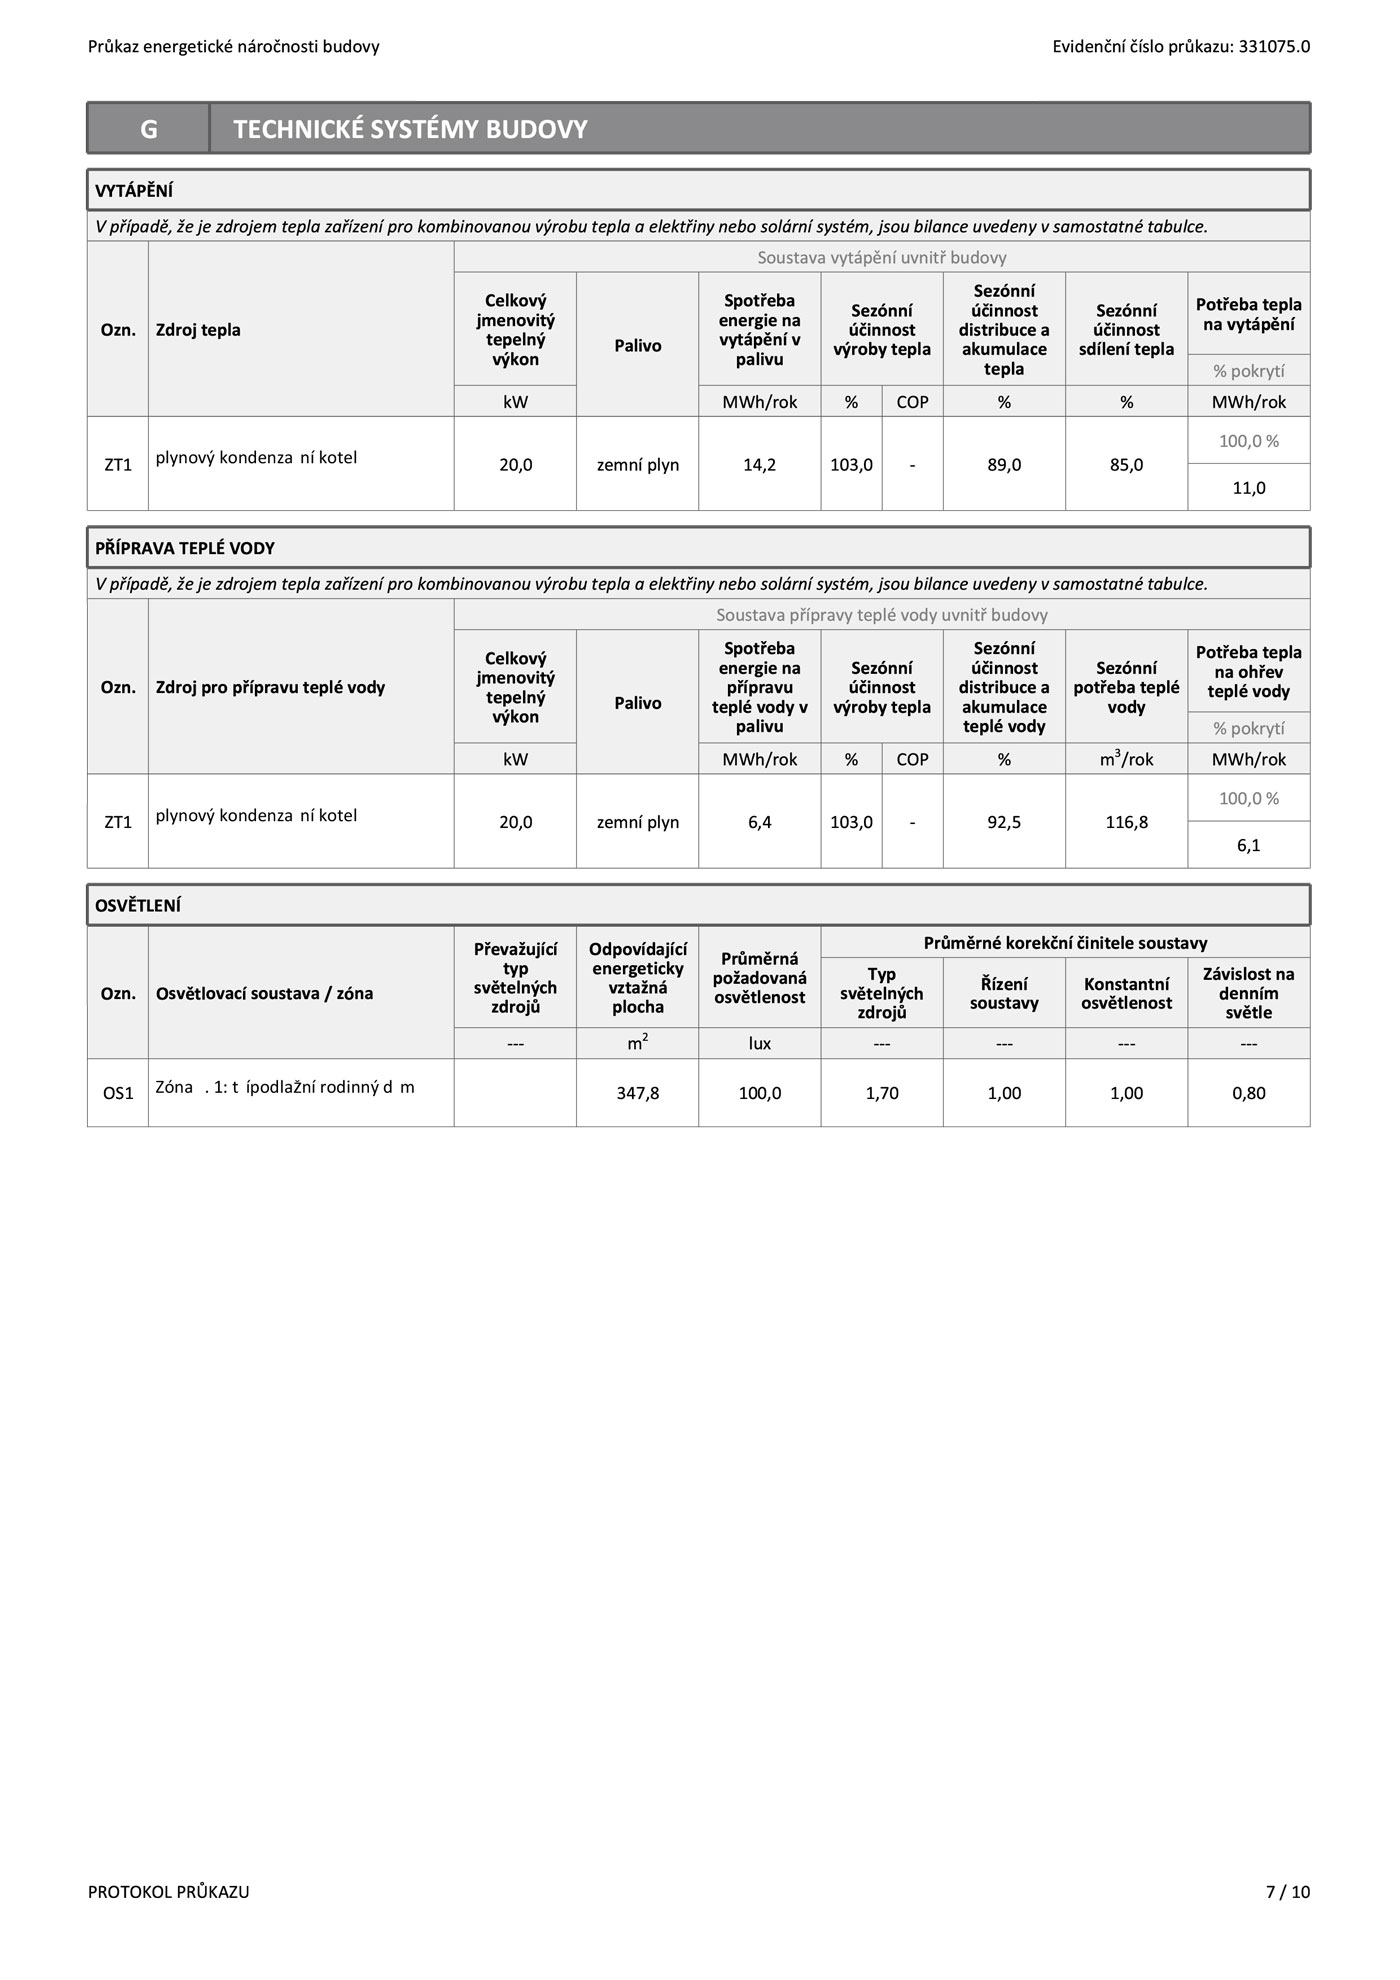 RD-Refico-IV---Luby_PENB_vyhl264-8